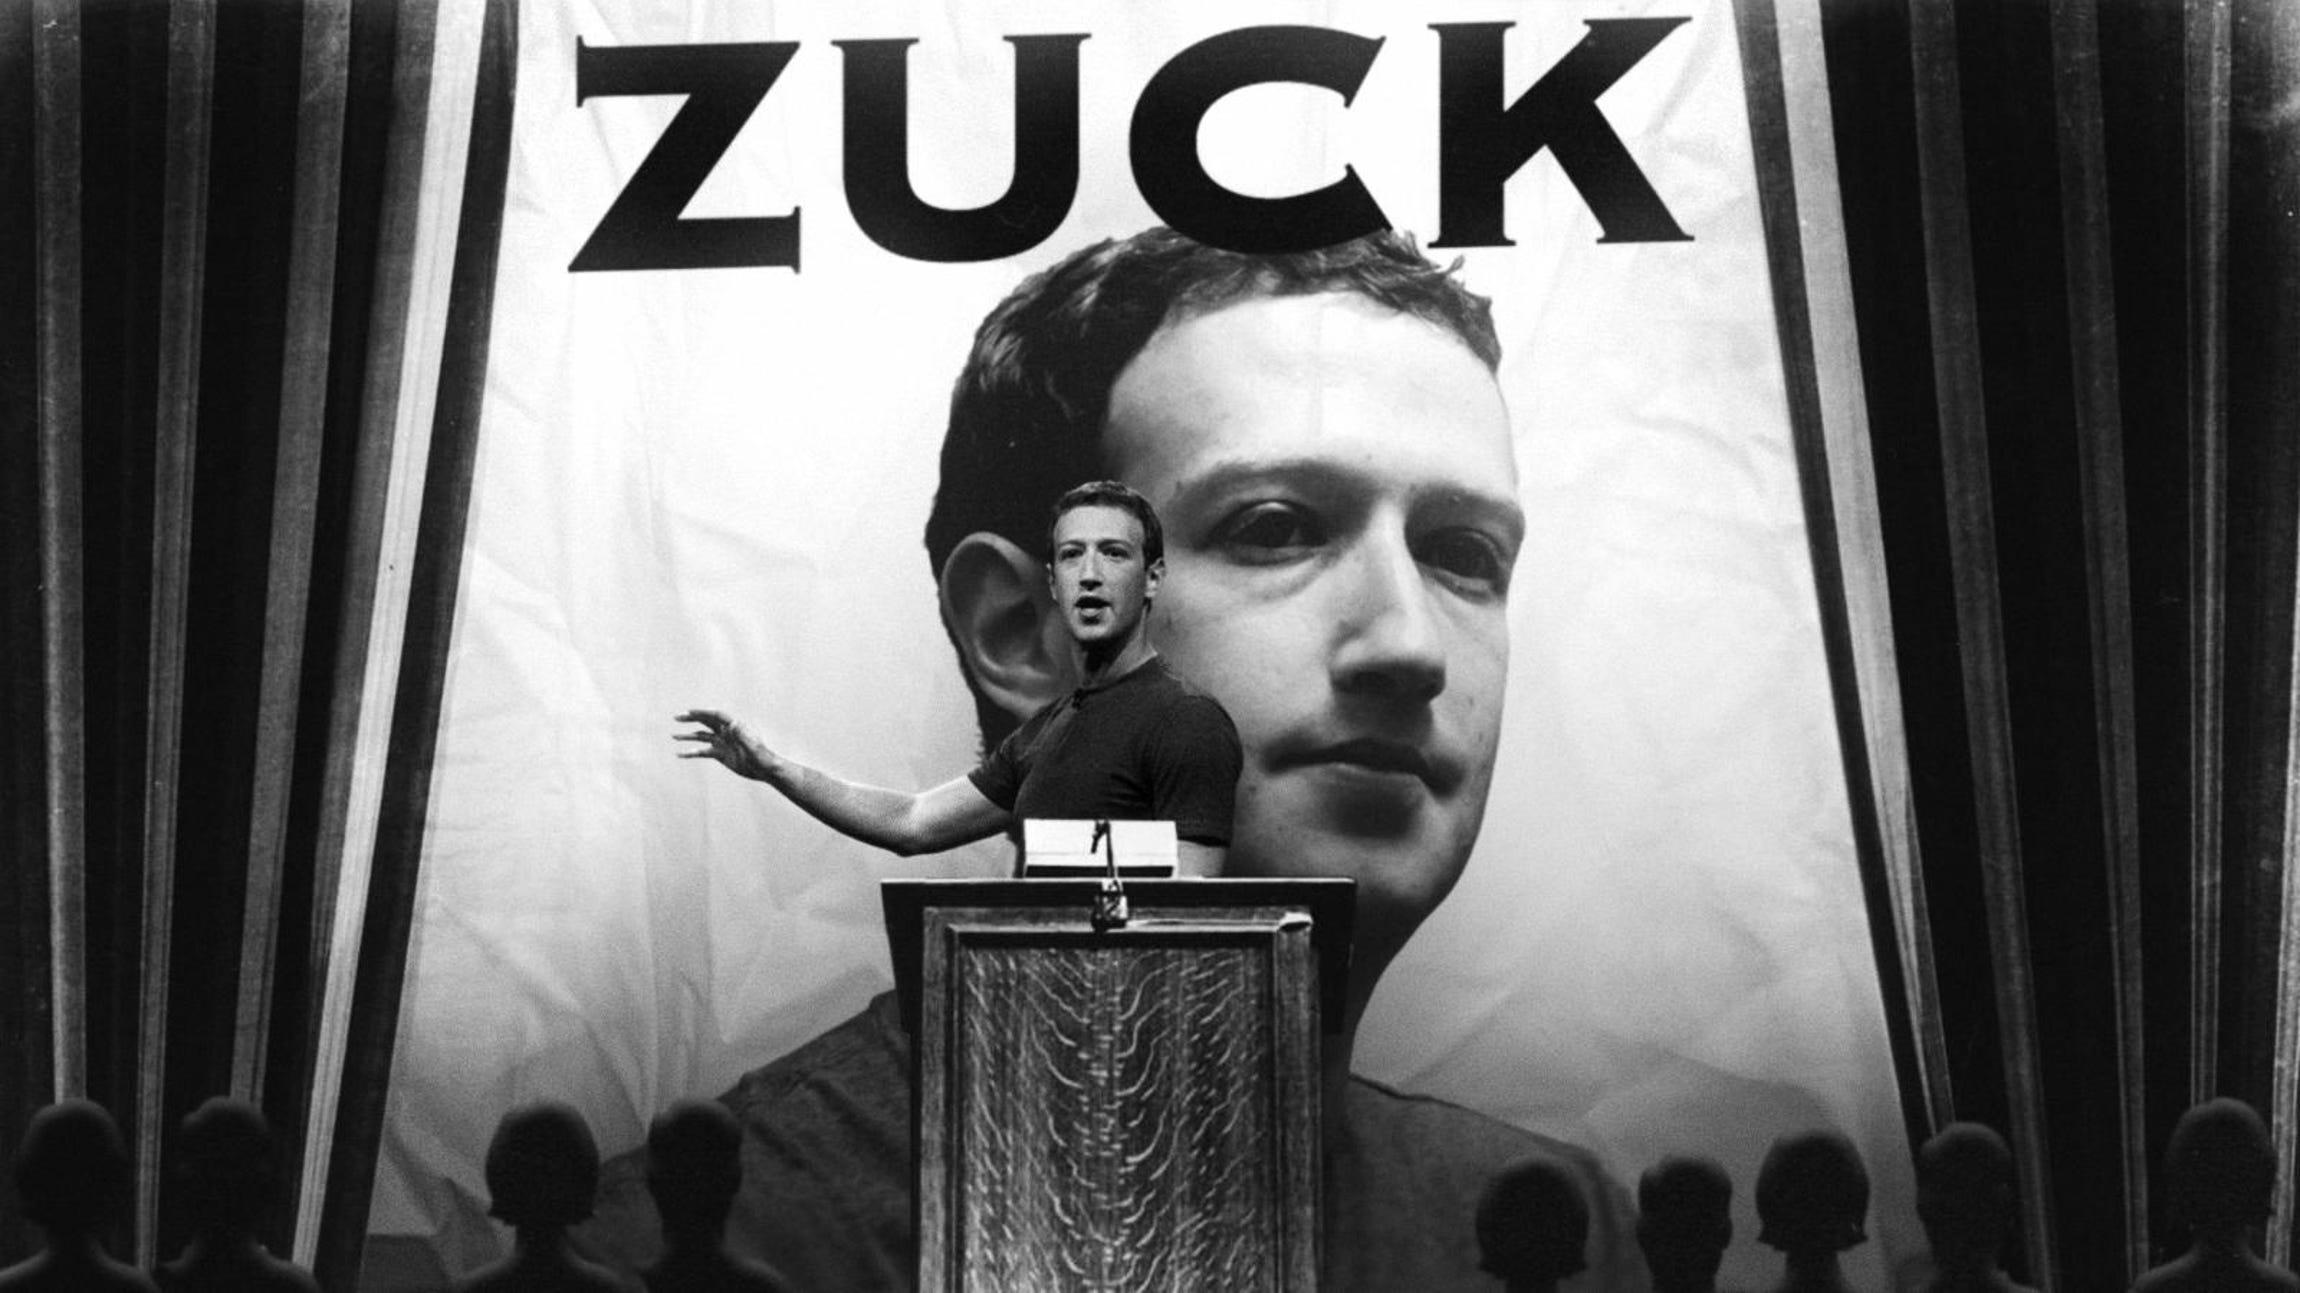 citizen-zuck-v4